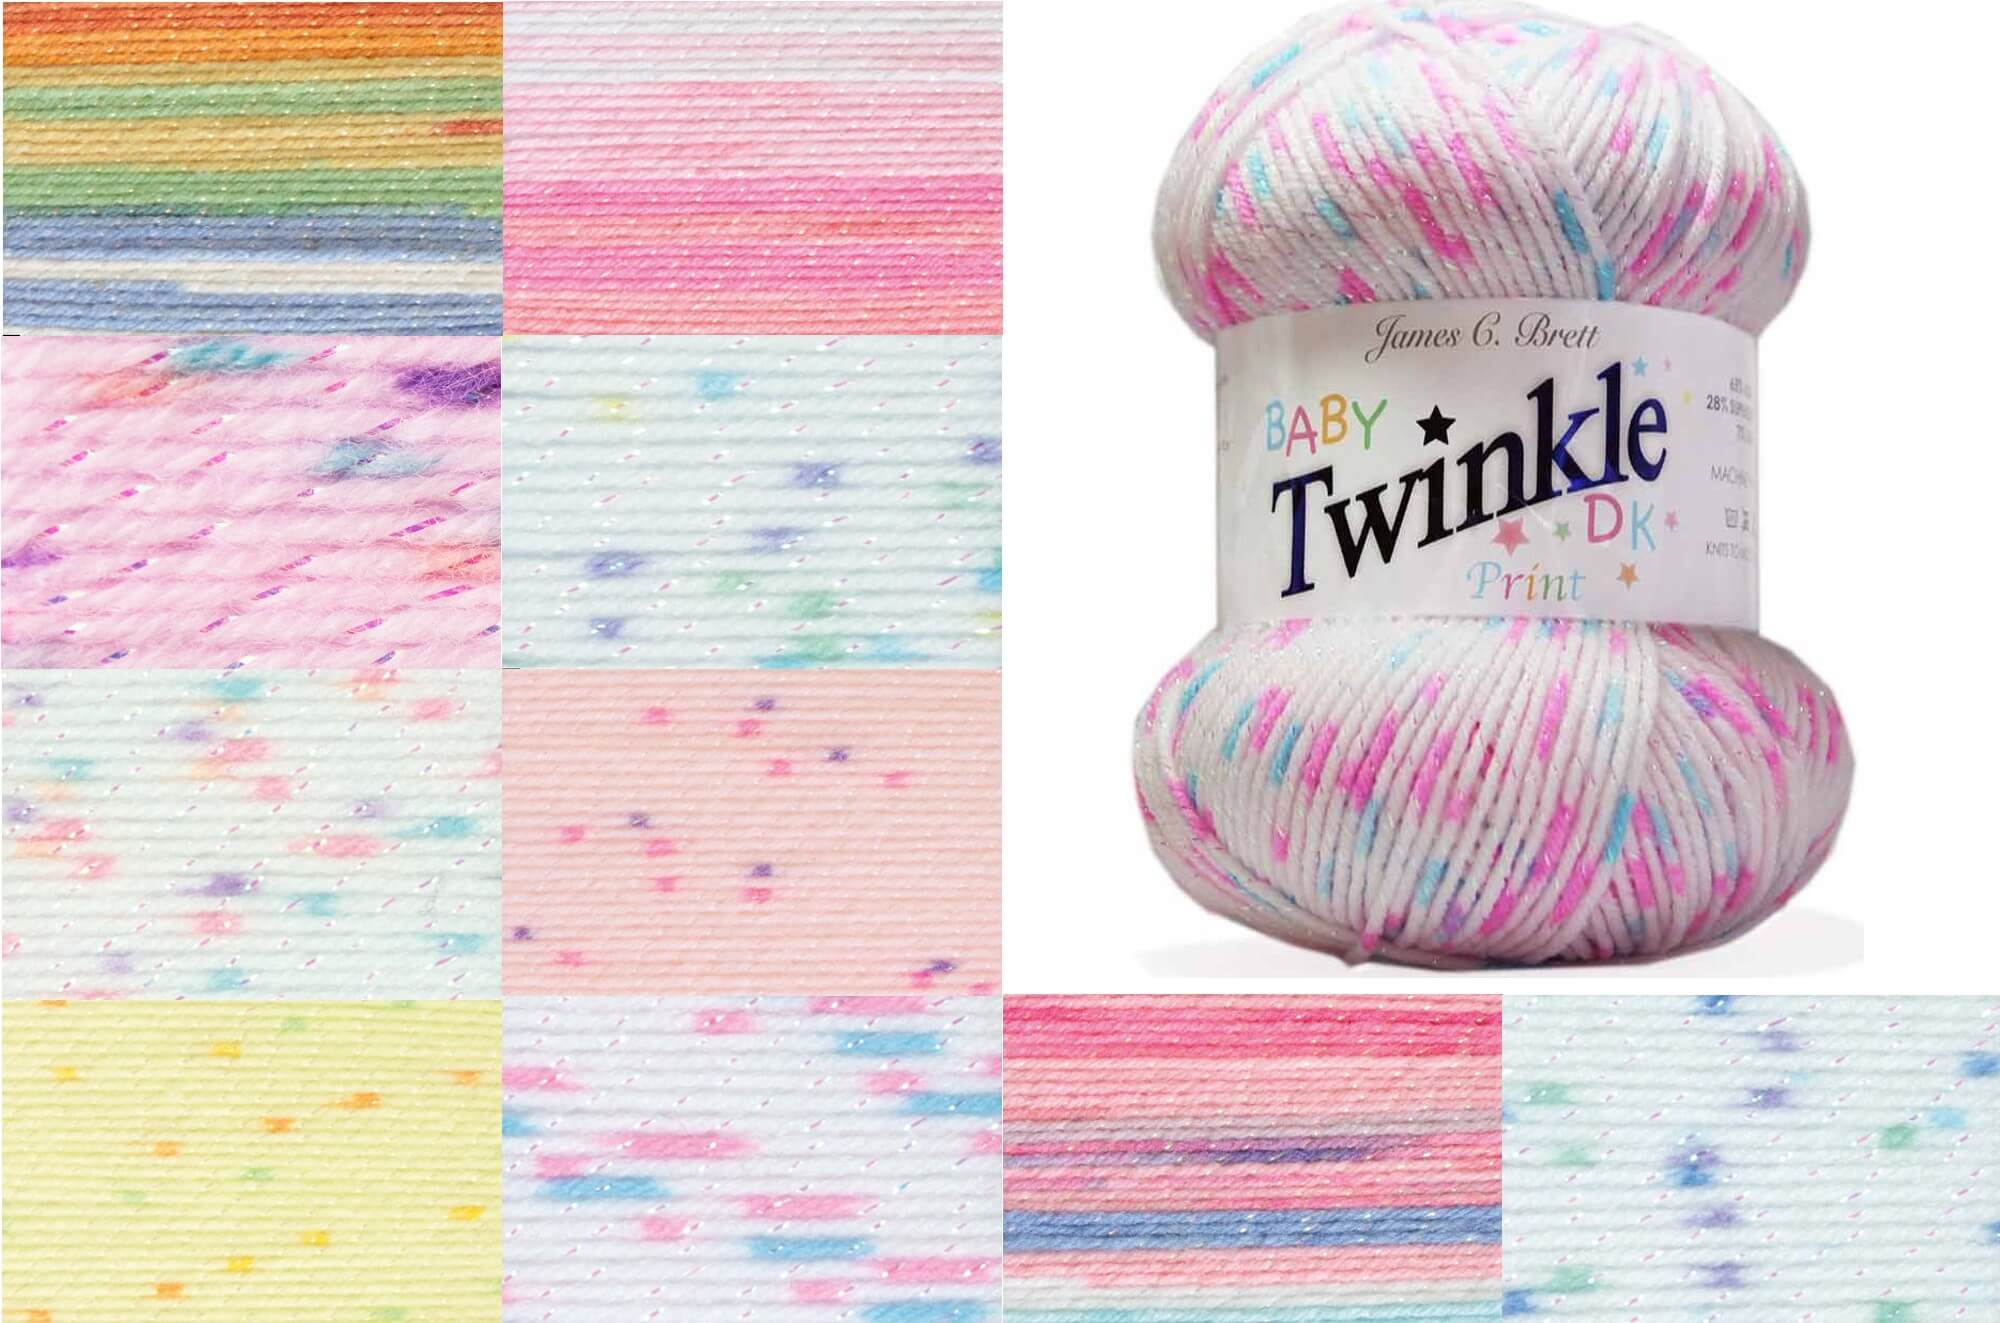 James C Brett Baby Twinkle Print DK Yarn 100g Ball Knitting Yarn Knit Craft BTP10